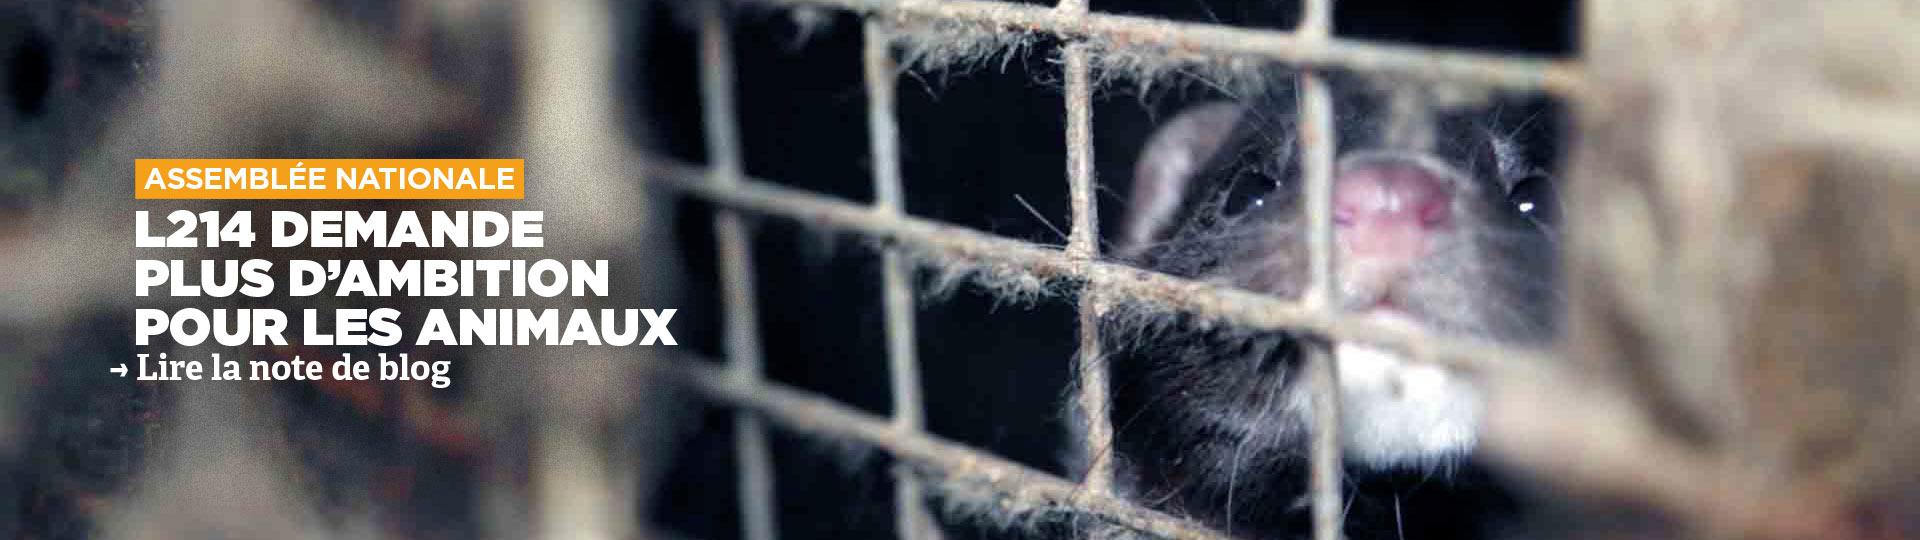 PPL Maltraitance animale